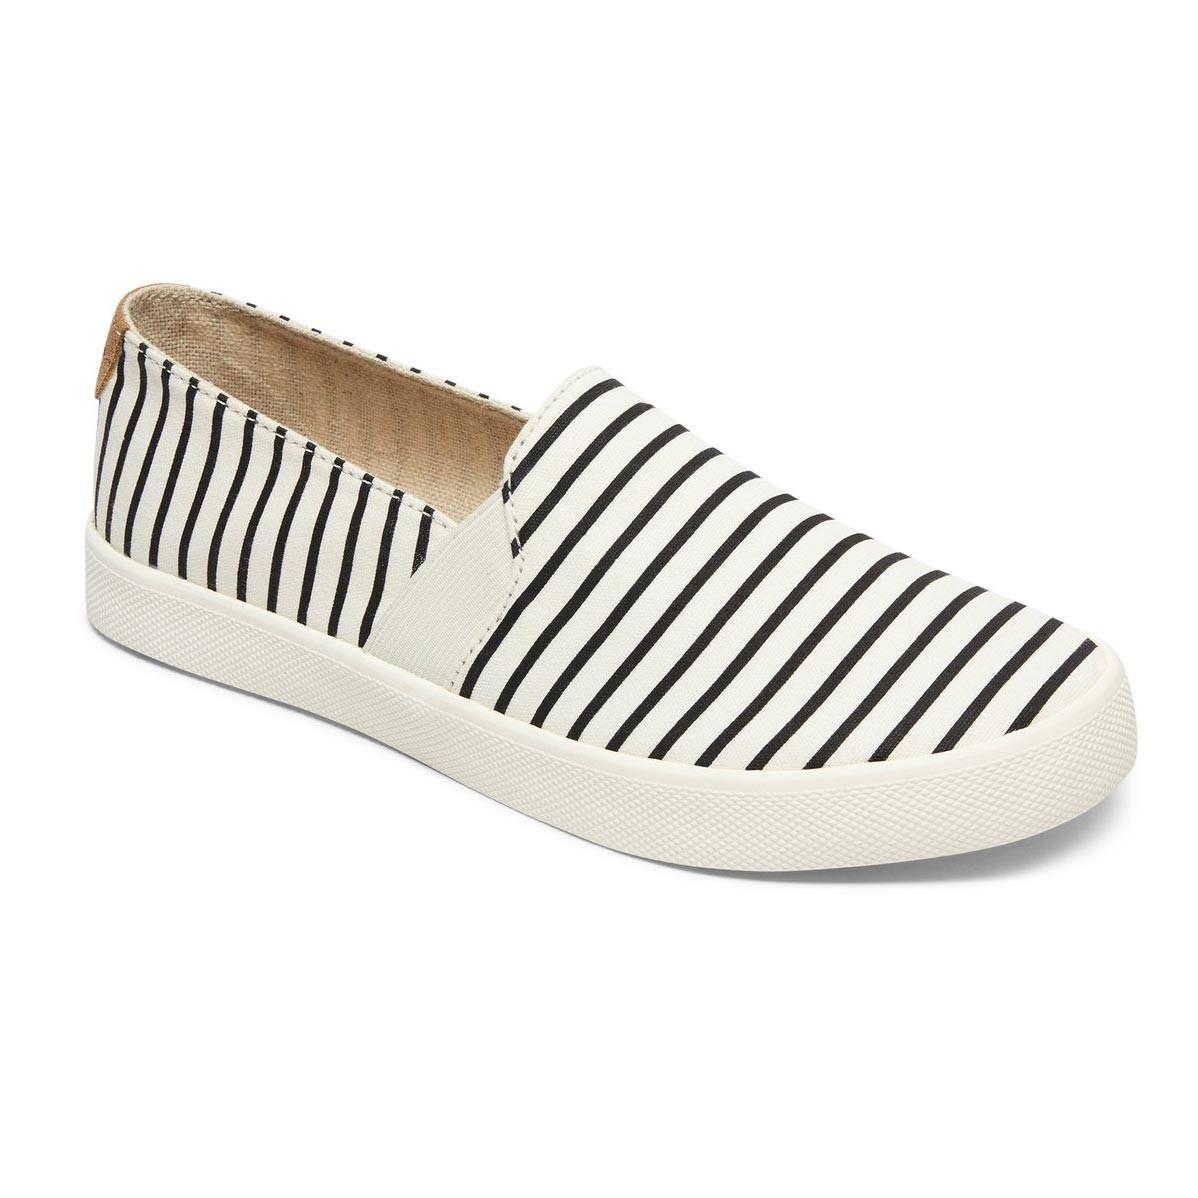 Roxy Atlanta Ii white/stripe